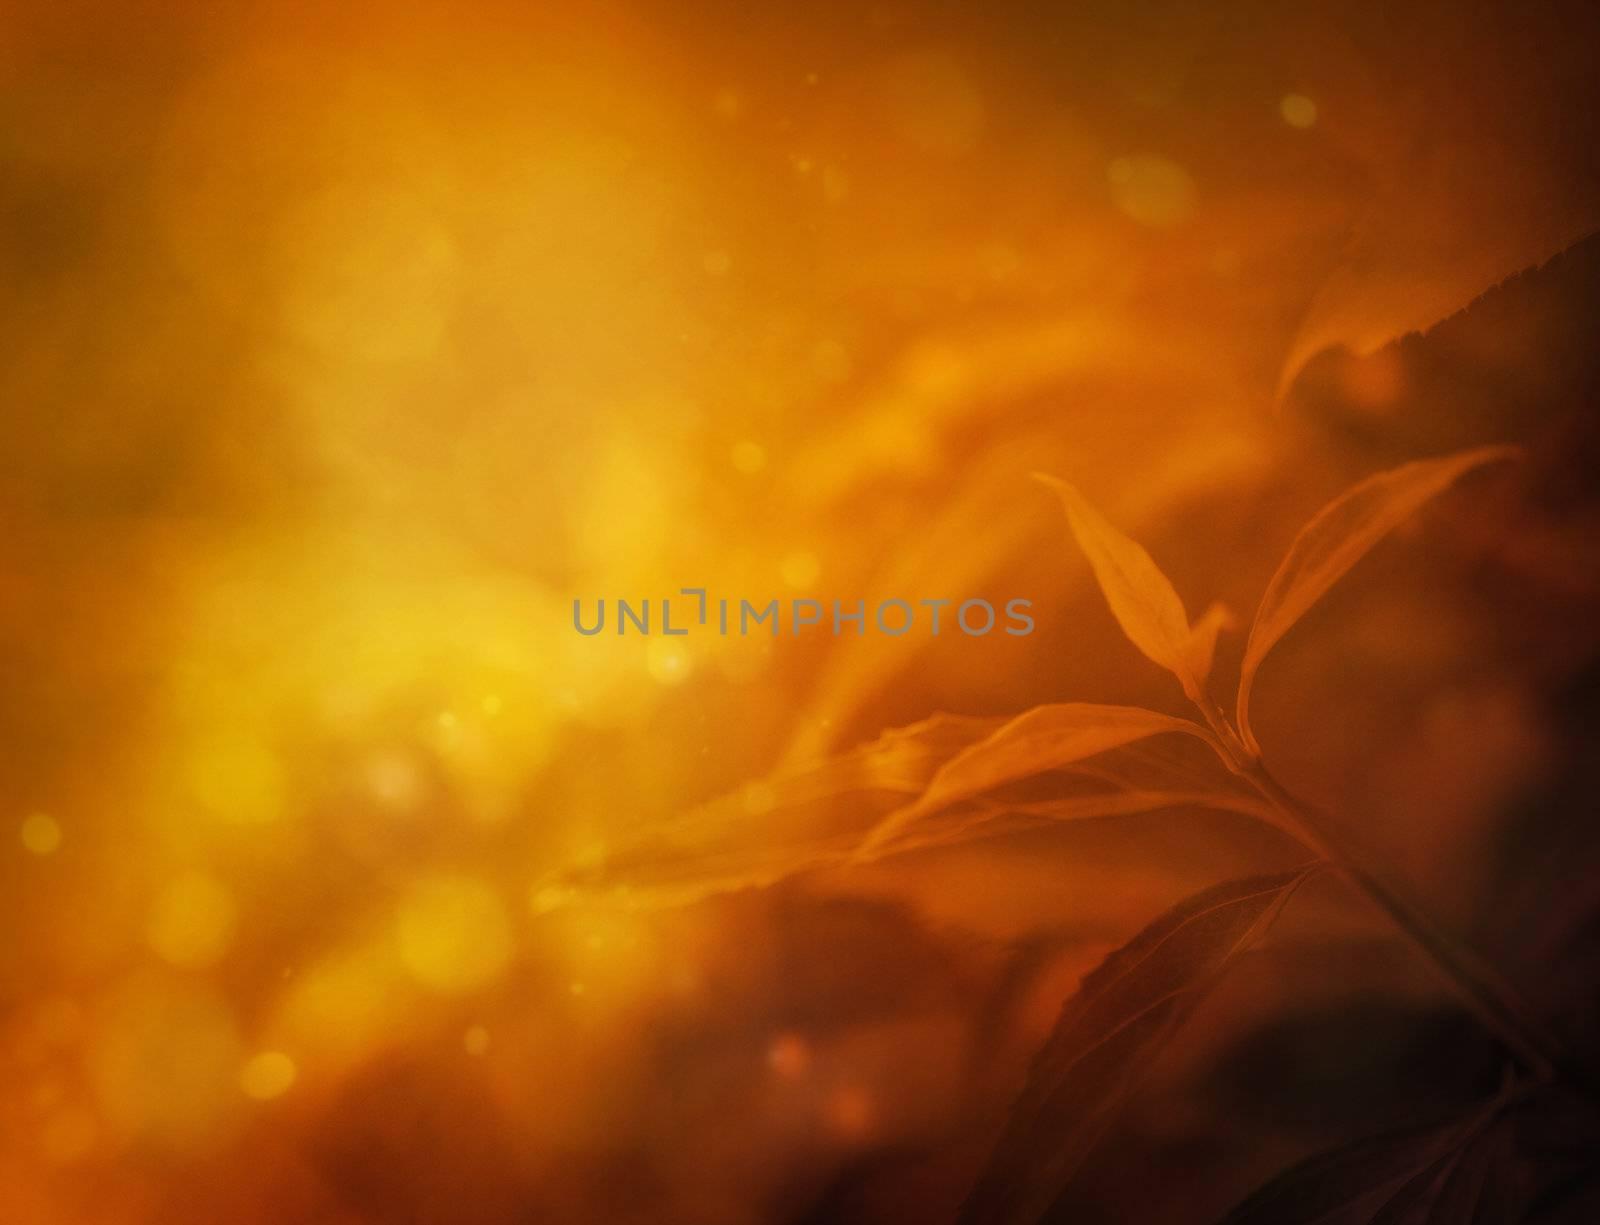 Autumn leavesbackground by mythja